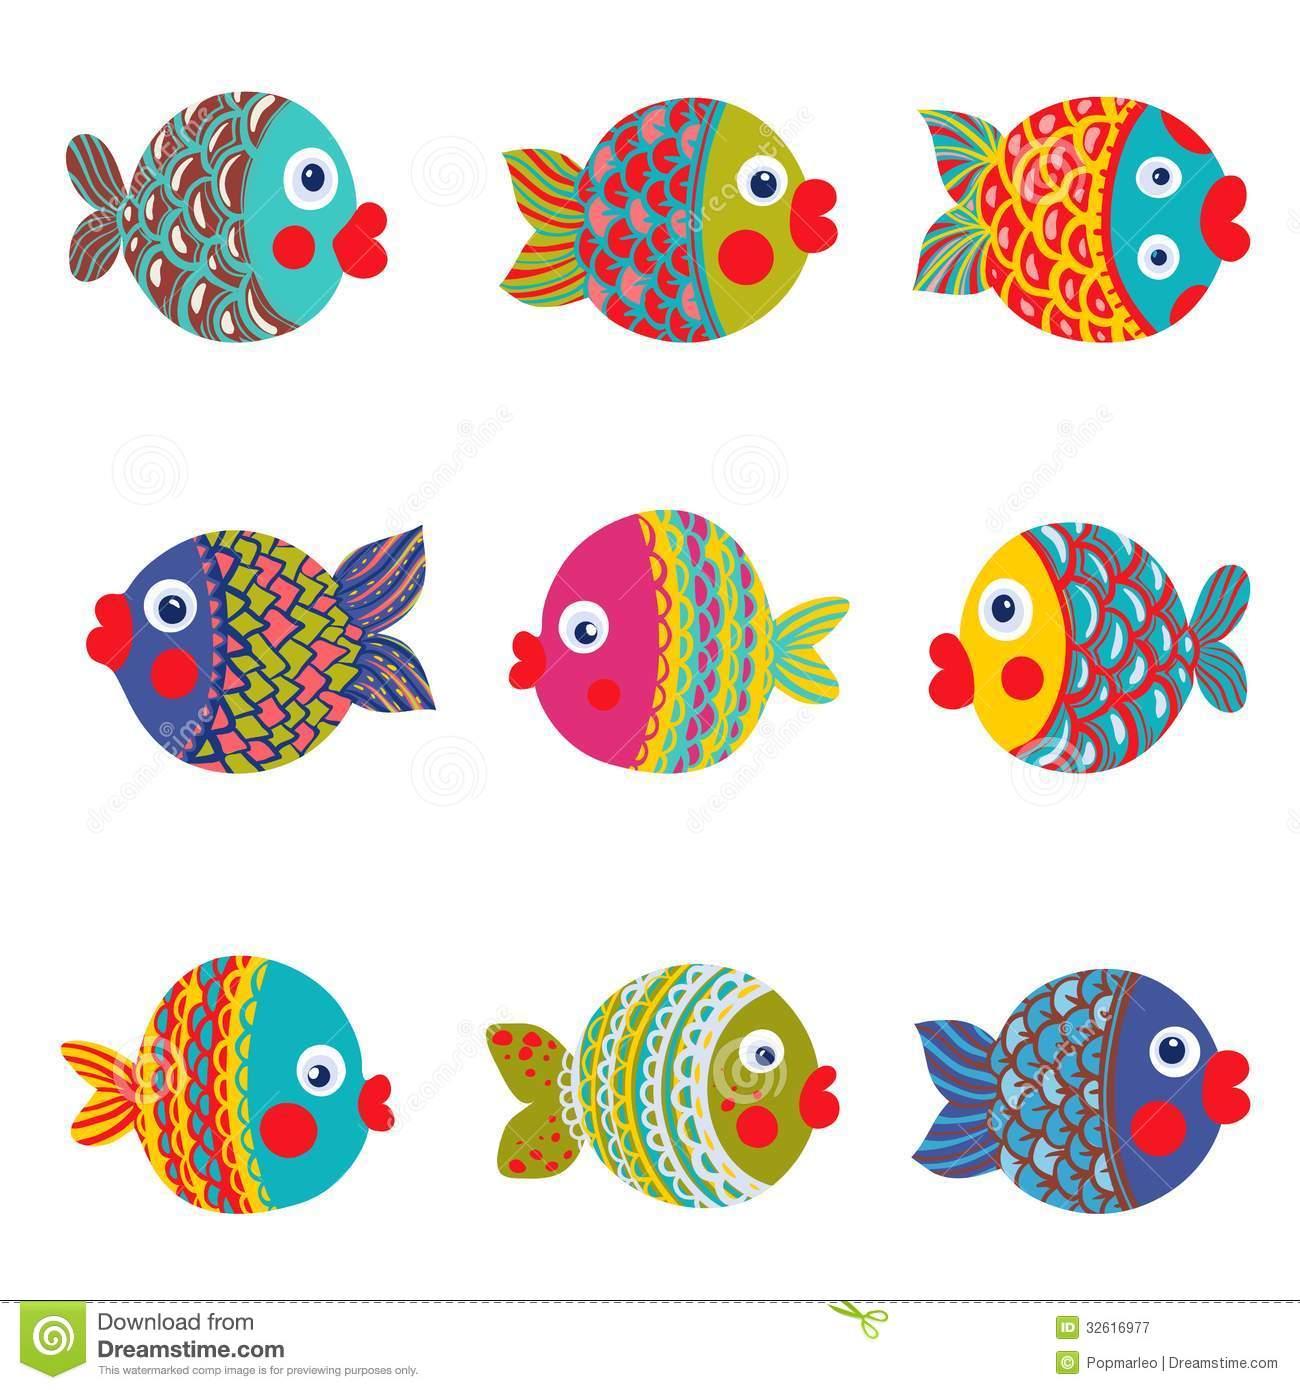 Desenhos de peixes coloridos for Immagini di pesci disegnati